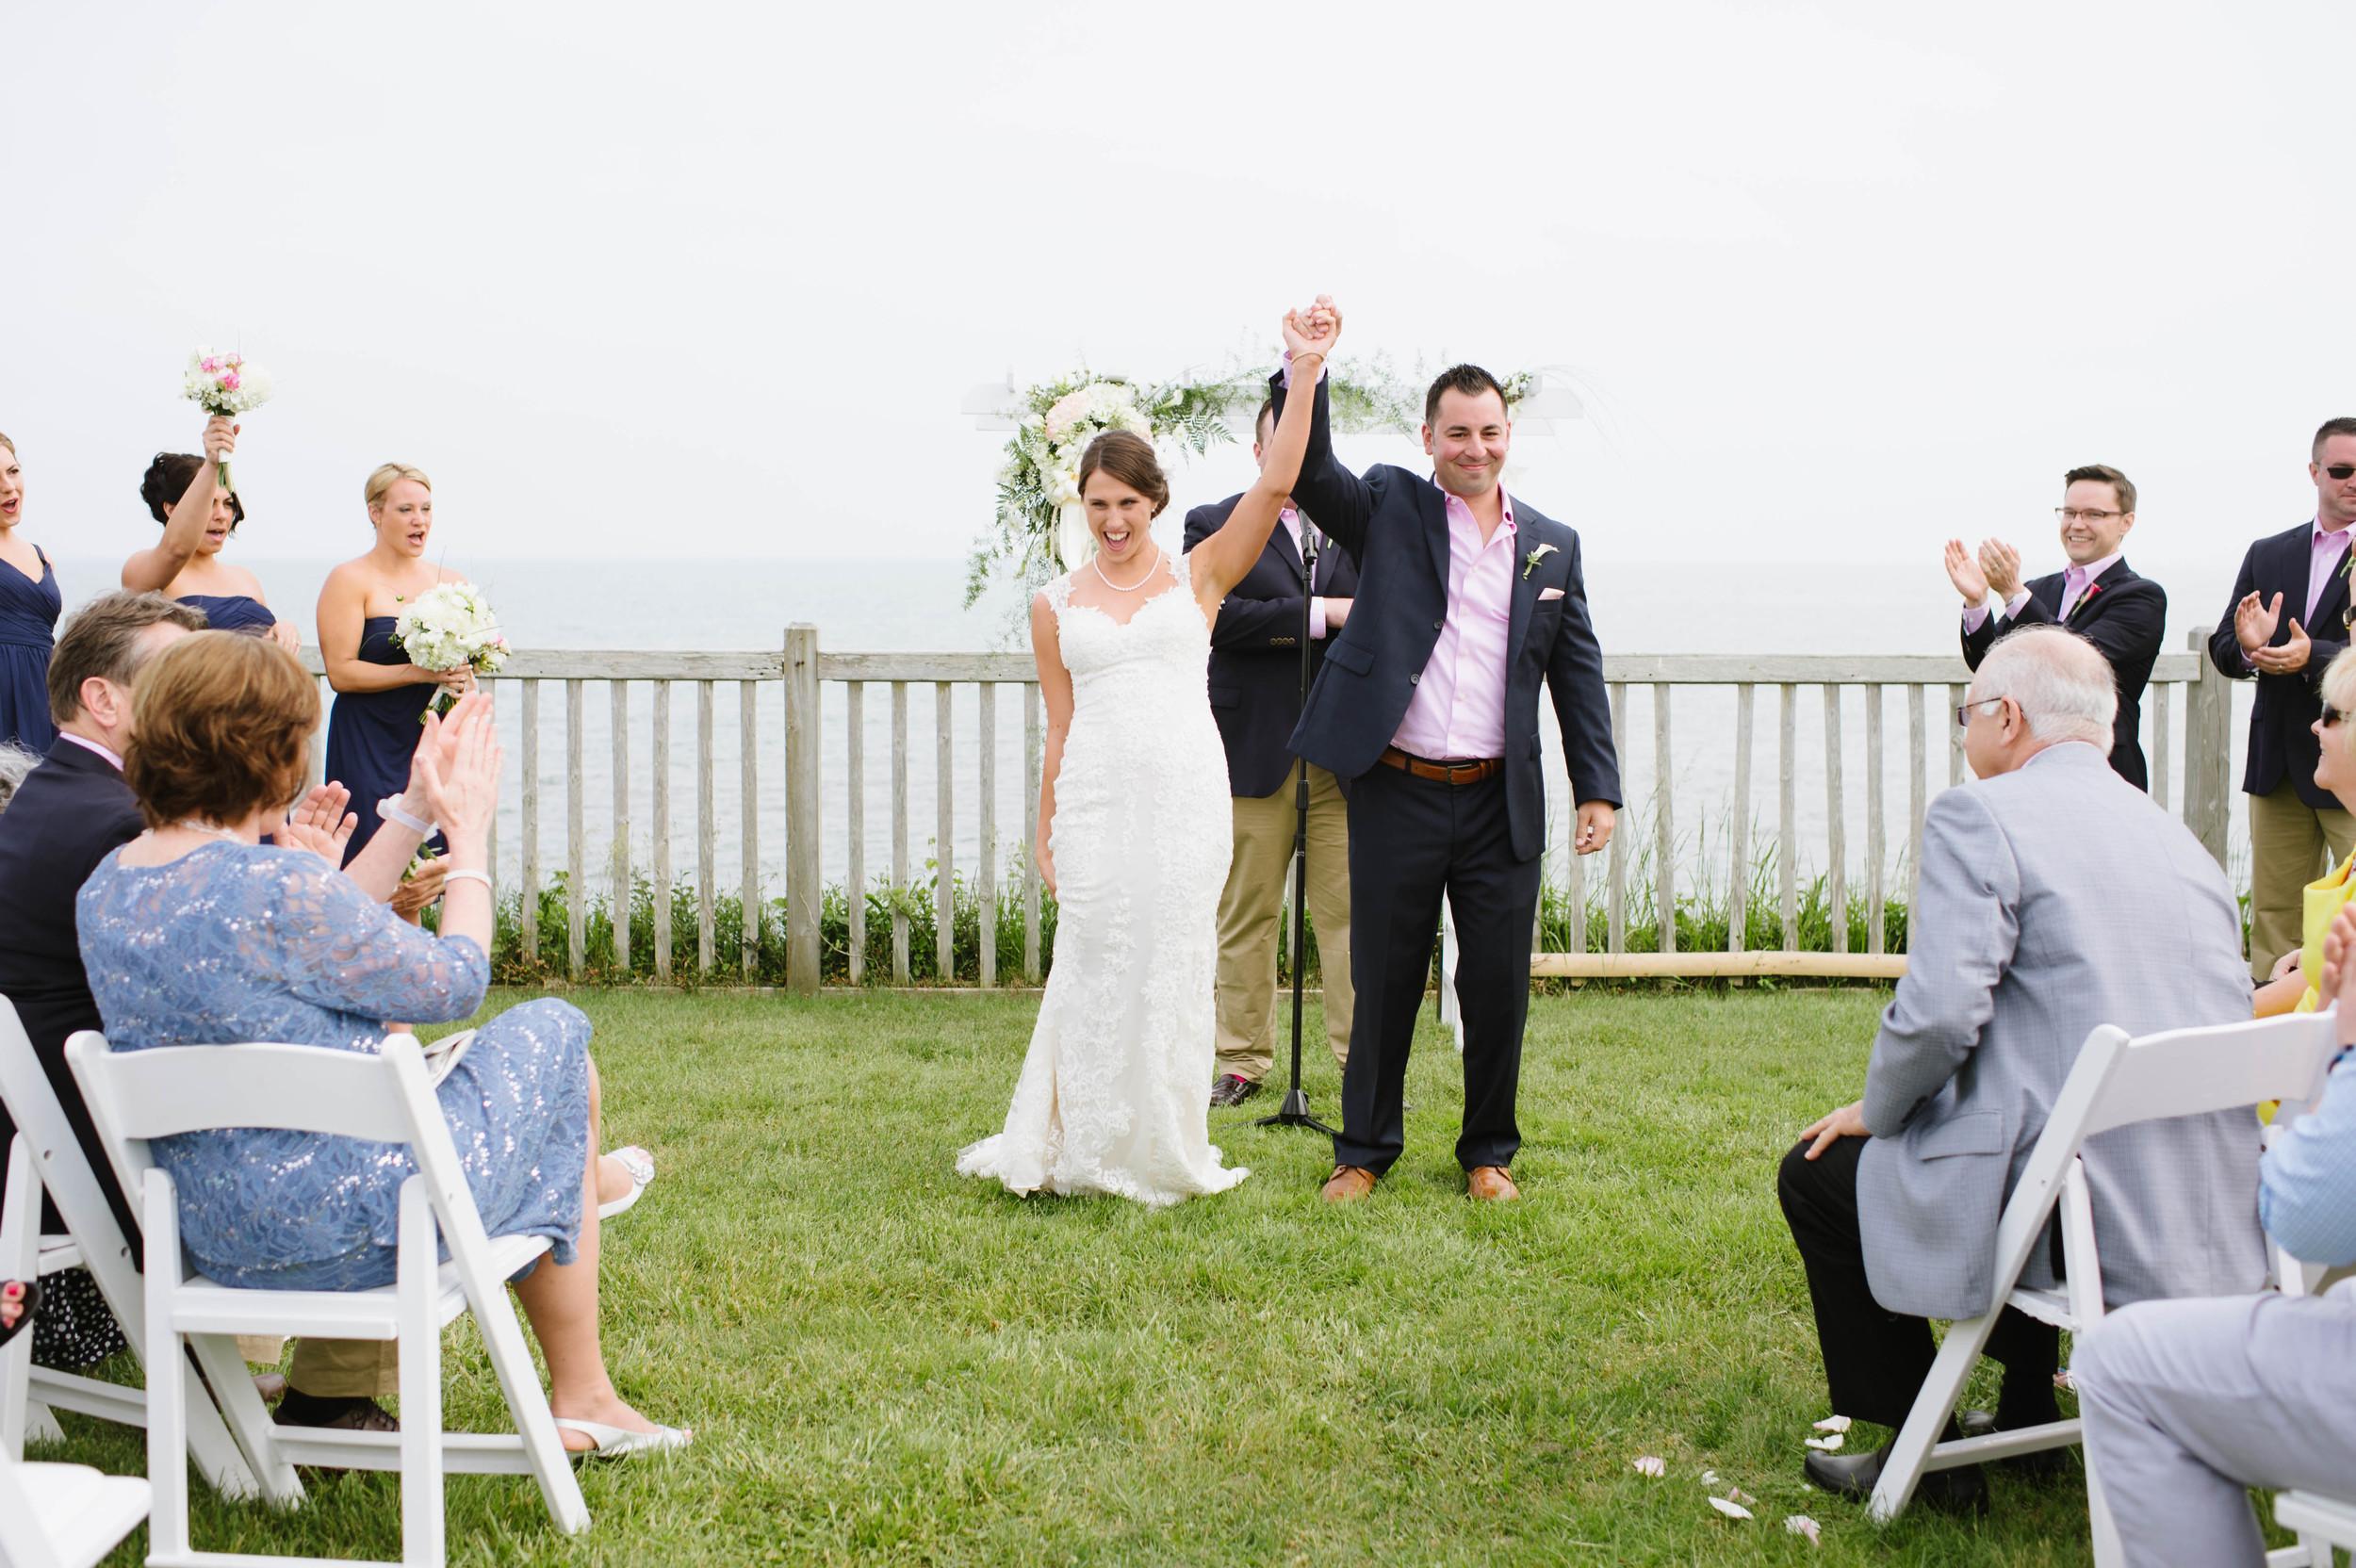 Pelham_House_Wedding_Cape_Cod014.jpg